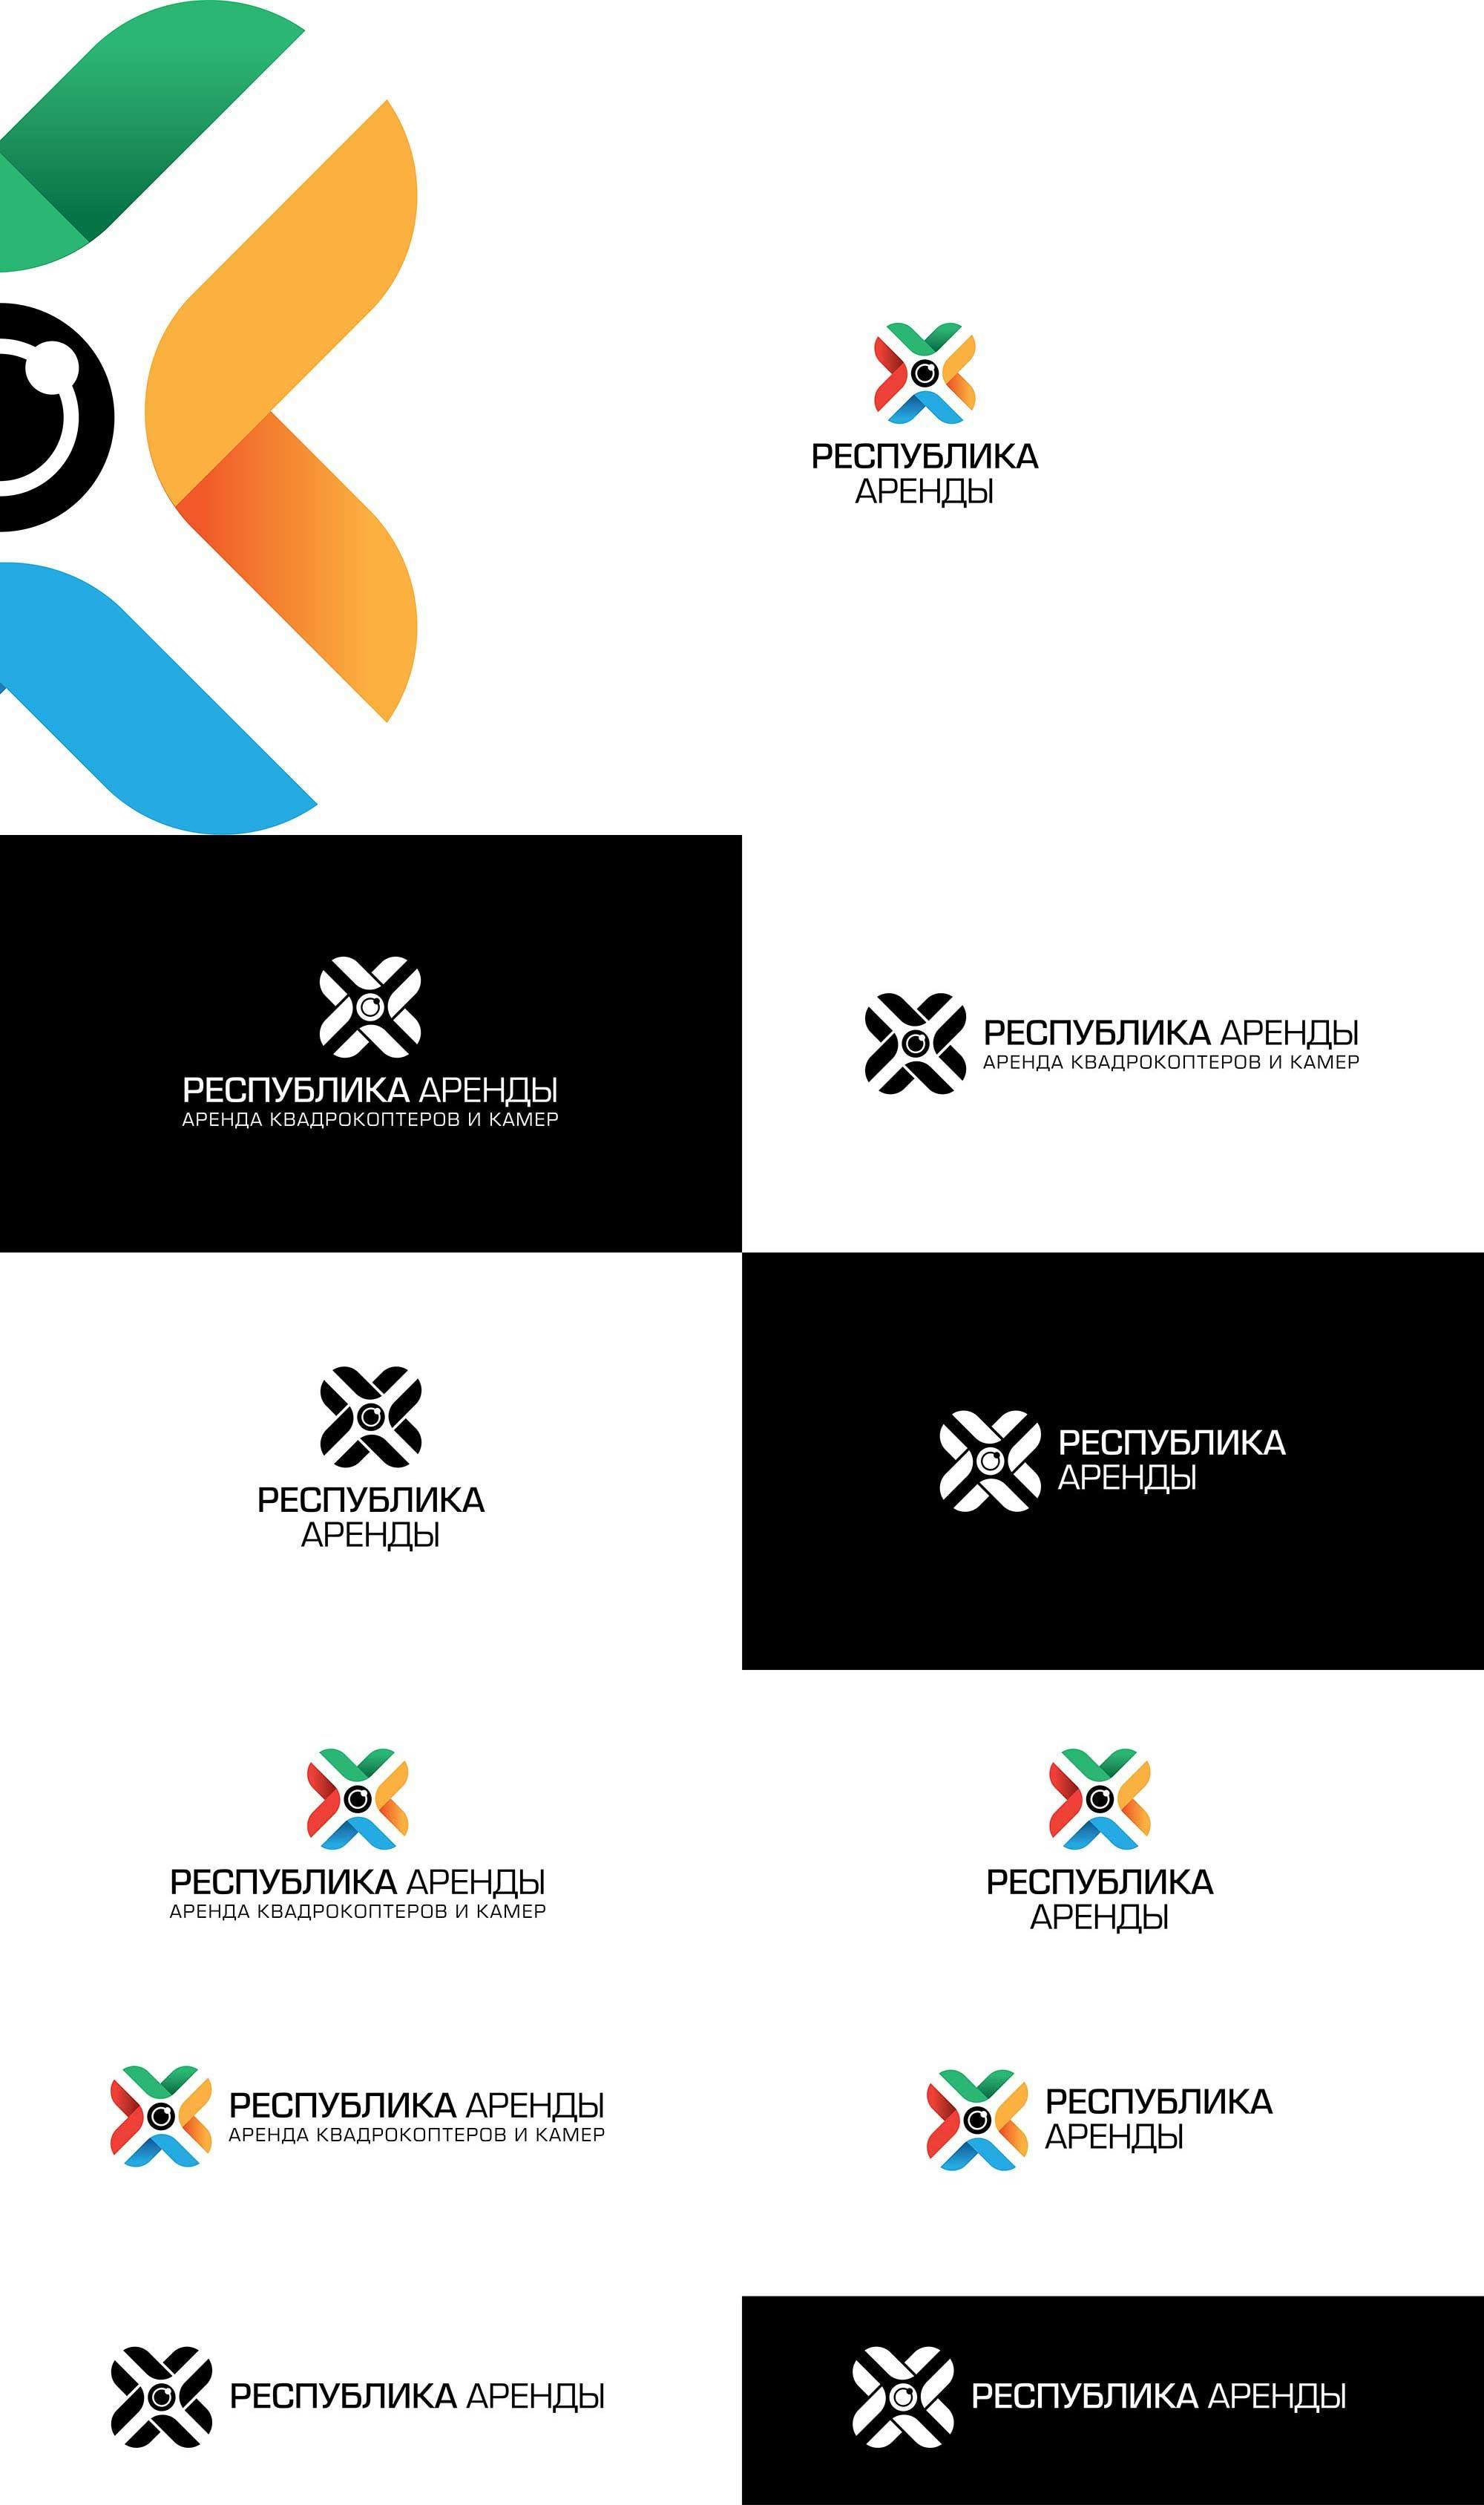 Логотип для компании по аренде квадракоптеров - дизайнер vadimsoloviev